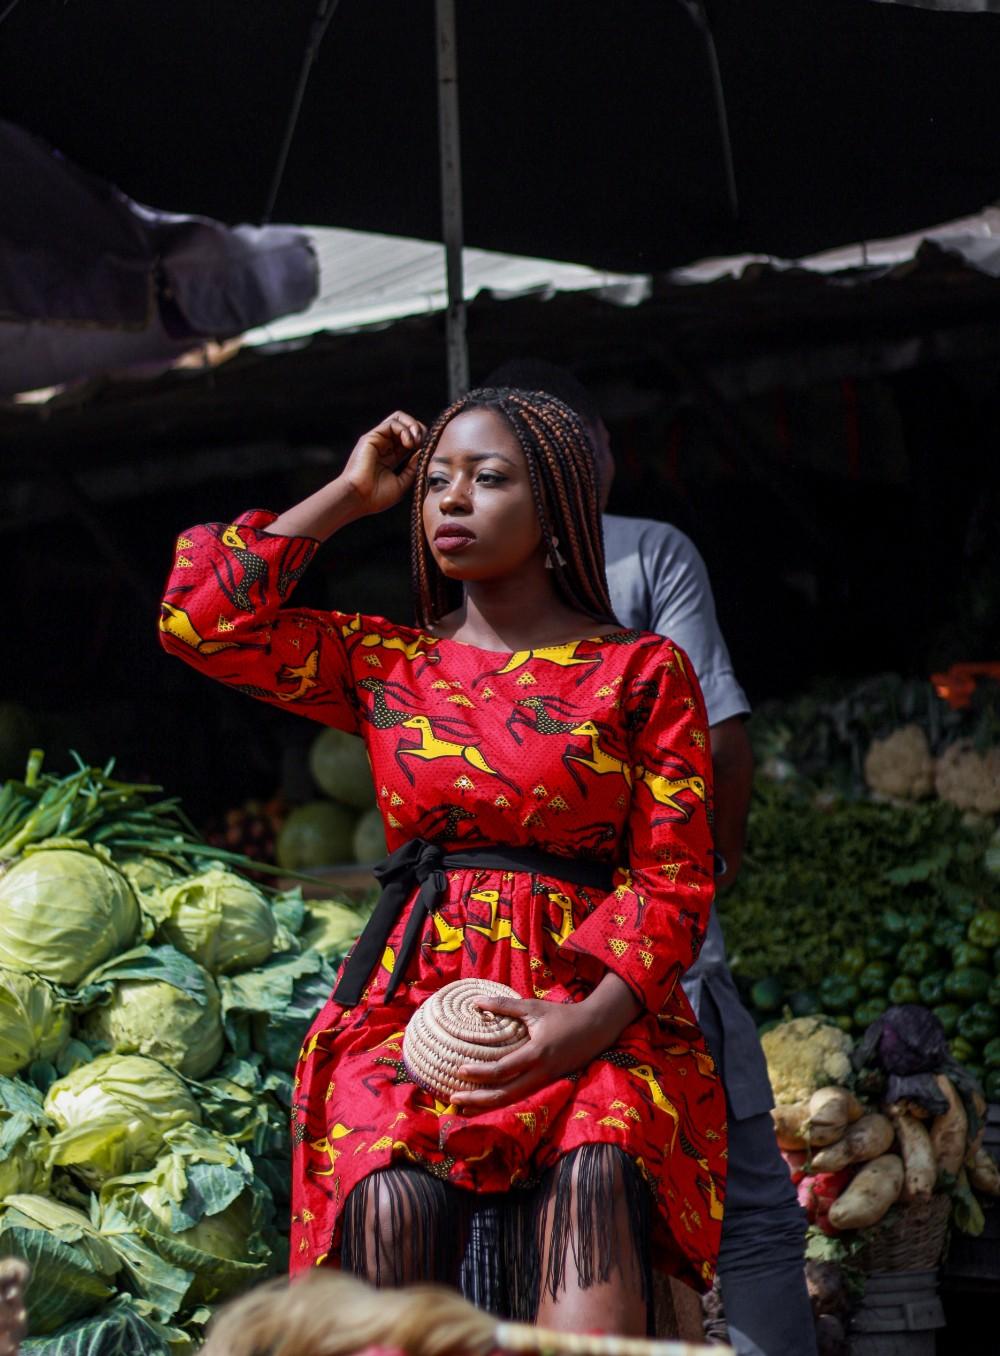 ankara African print in a nigerian market